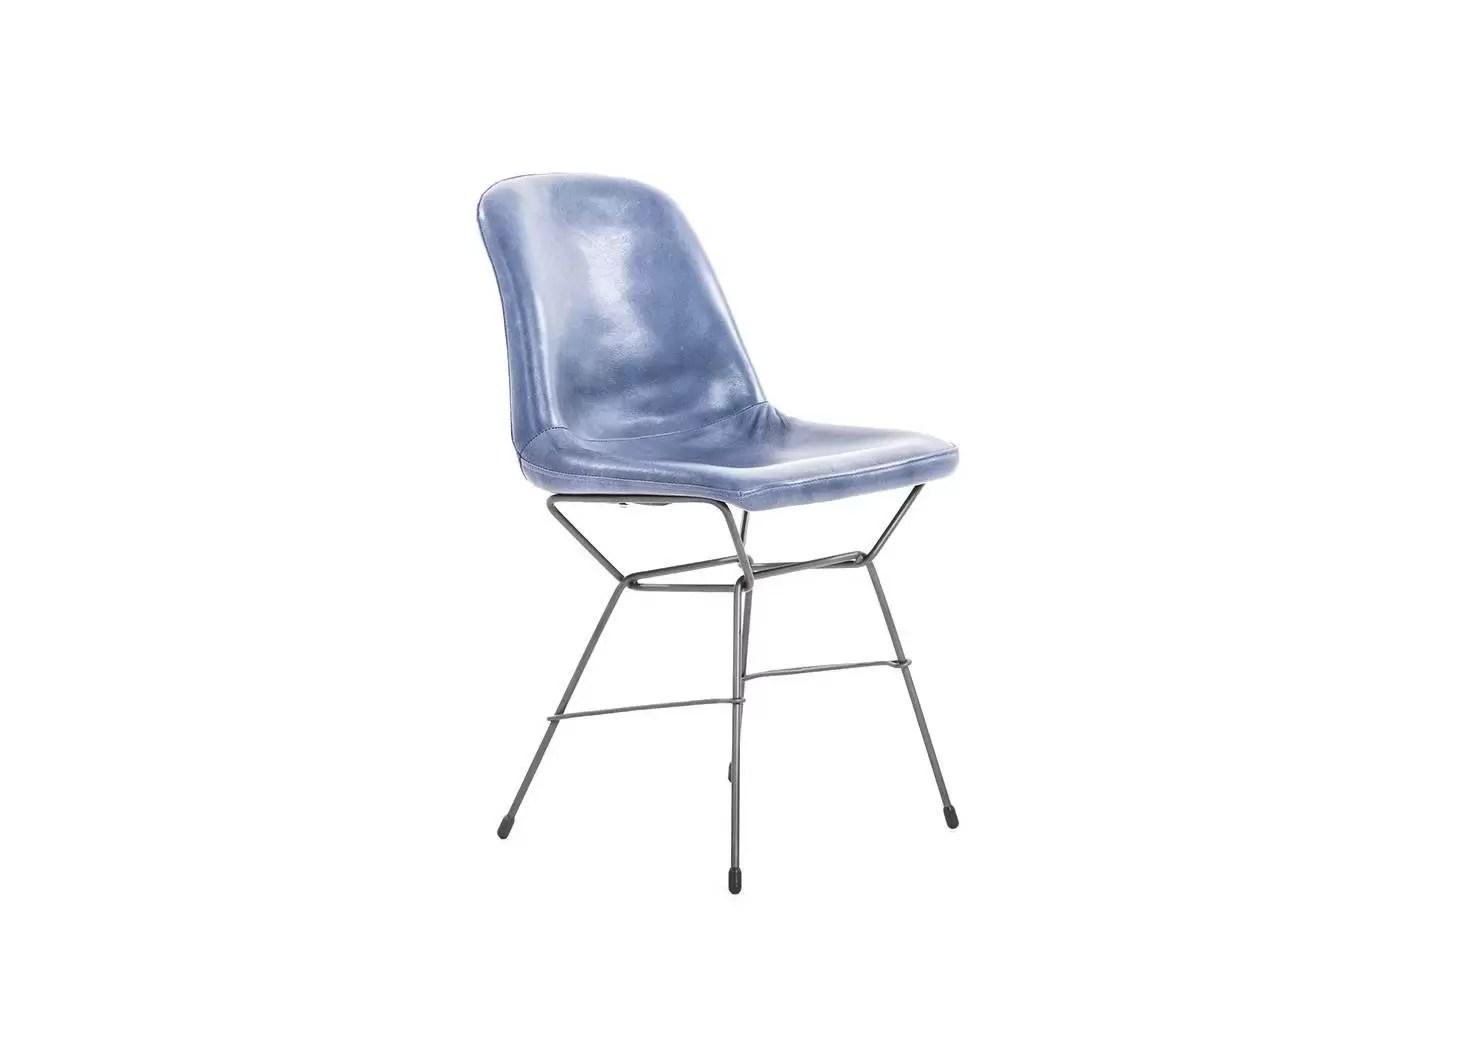 chaise rockford cuir bleu et metal